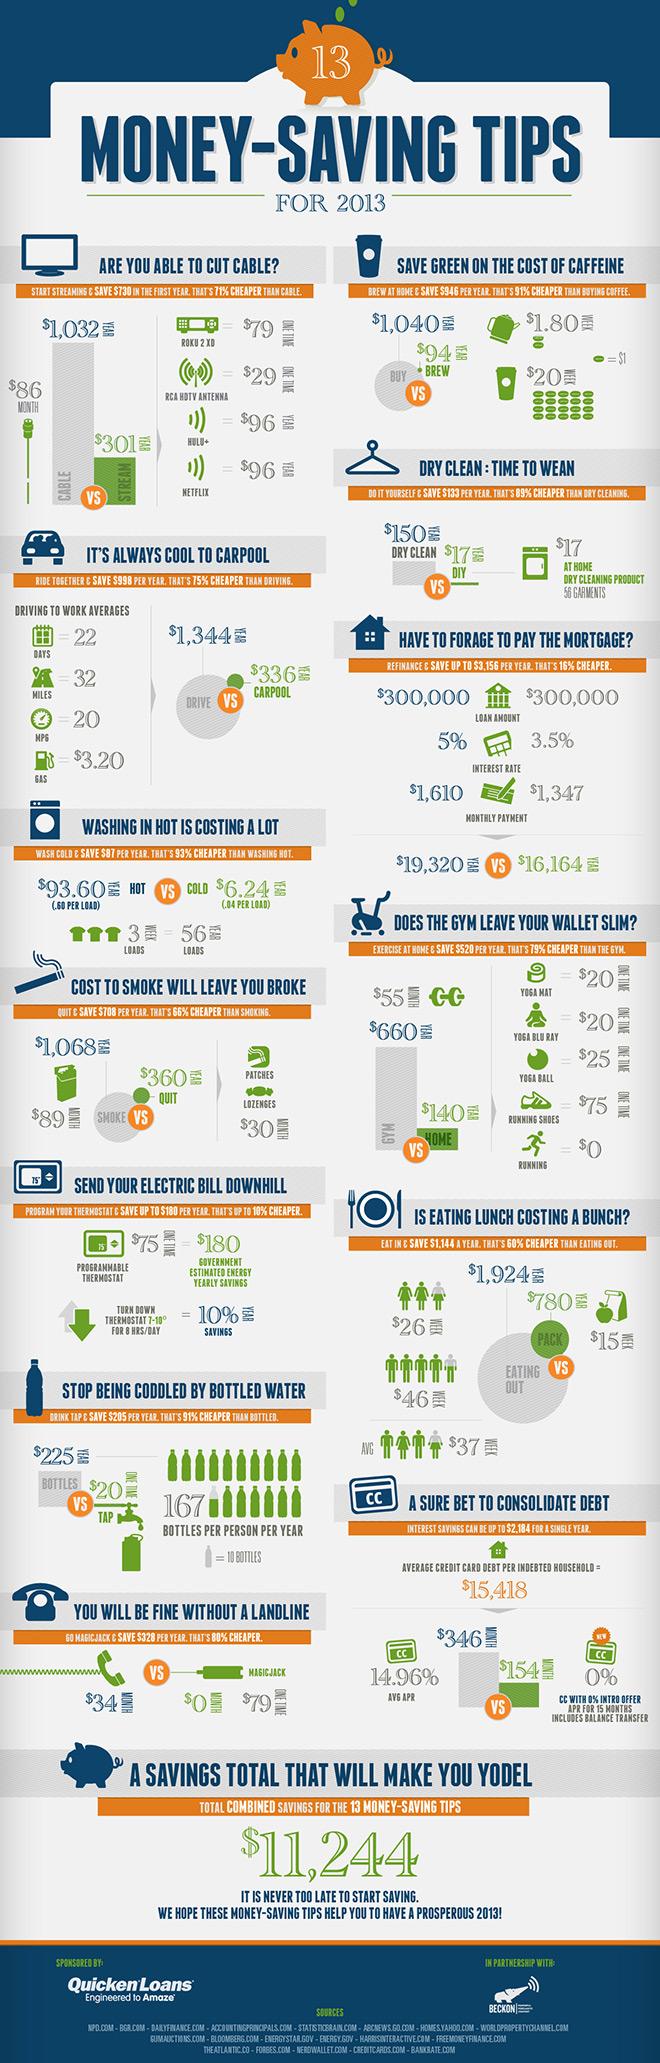 money-saving-tips-infographic